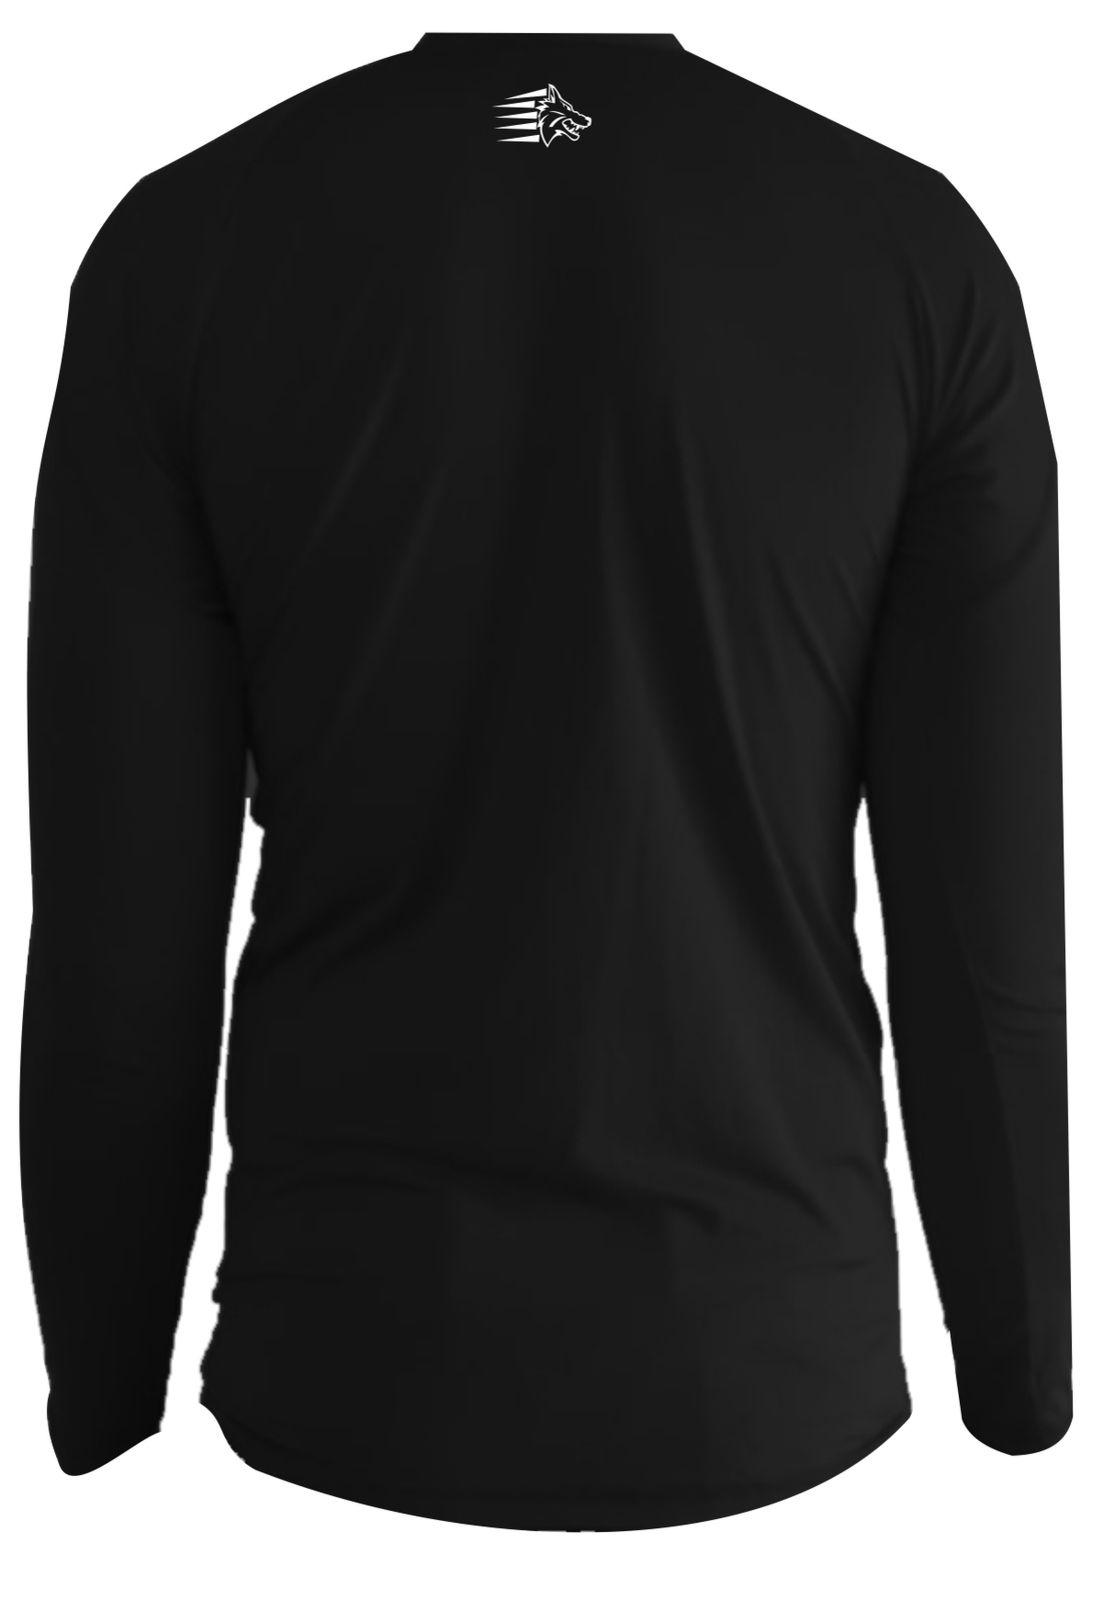 Camisa Manga Longa Proteção Solar UV 50+  Uppercut